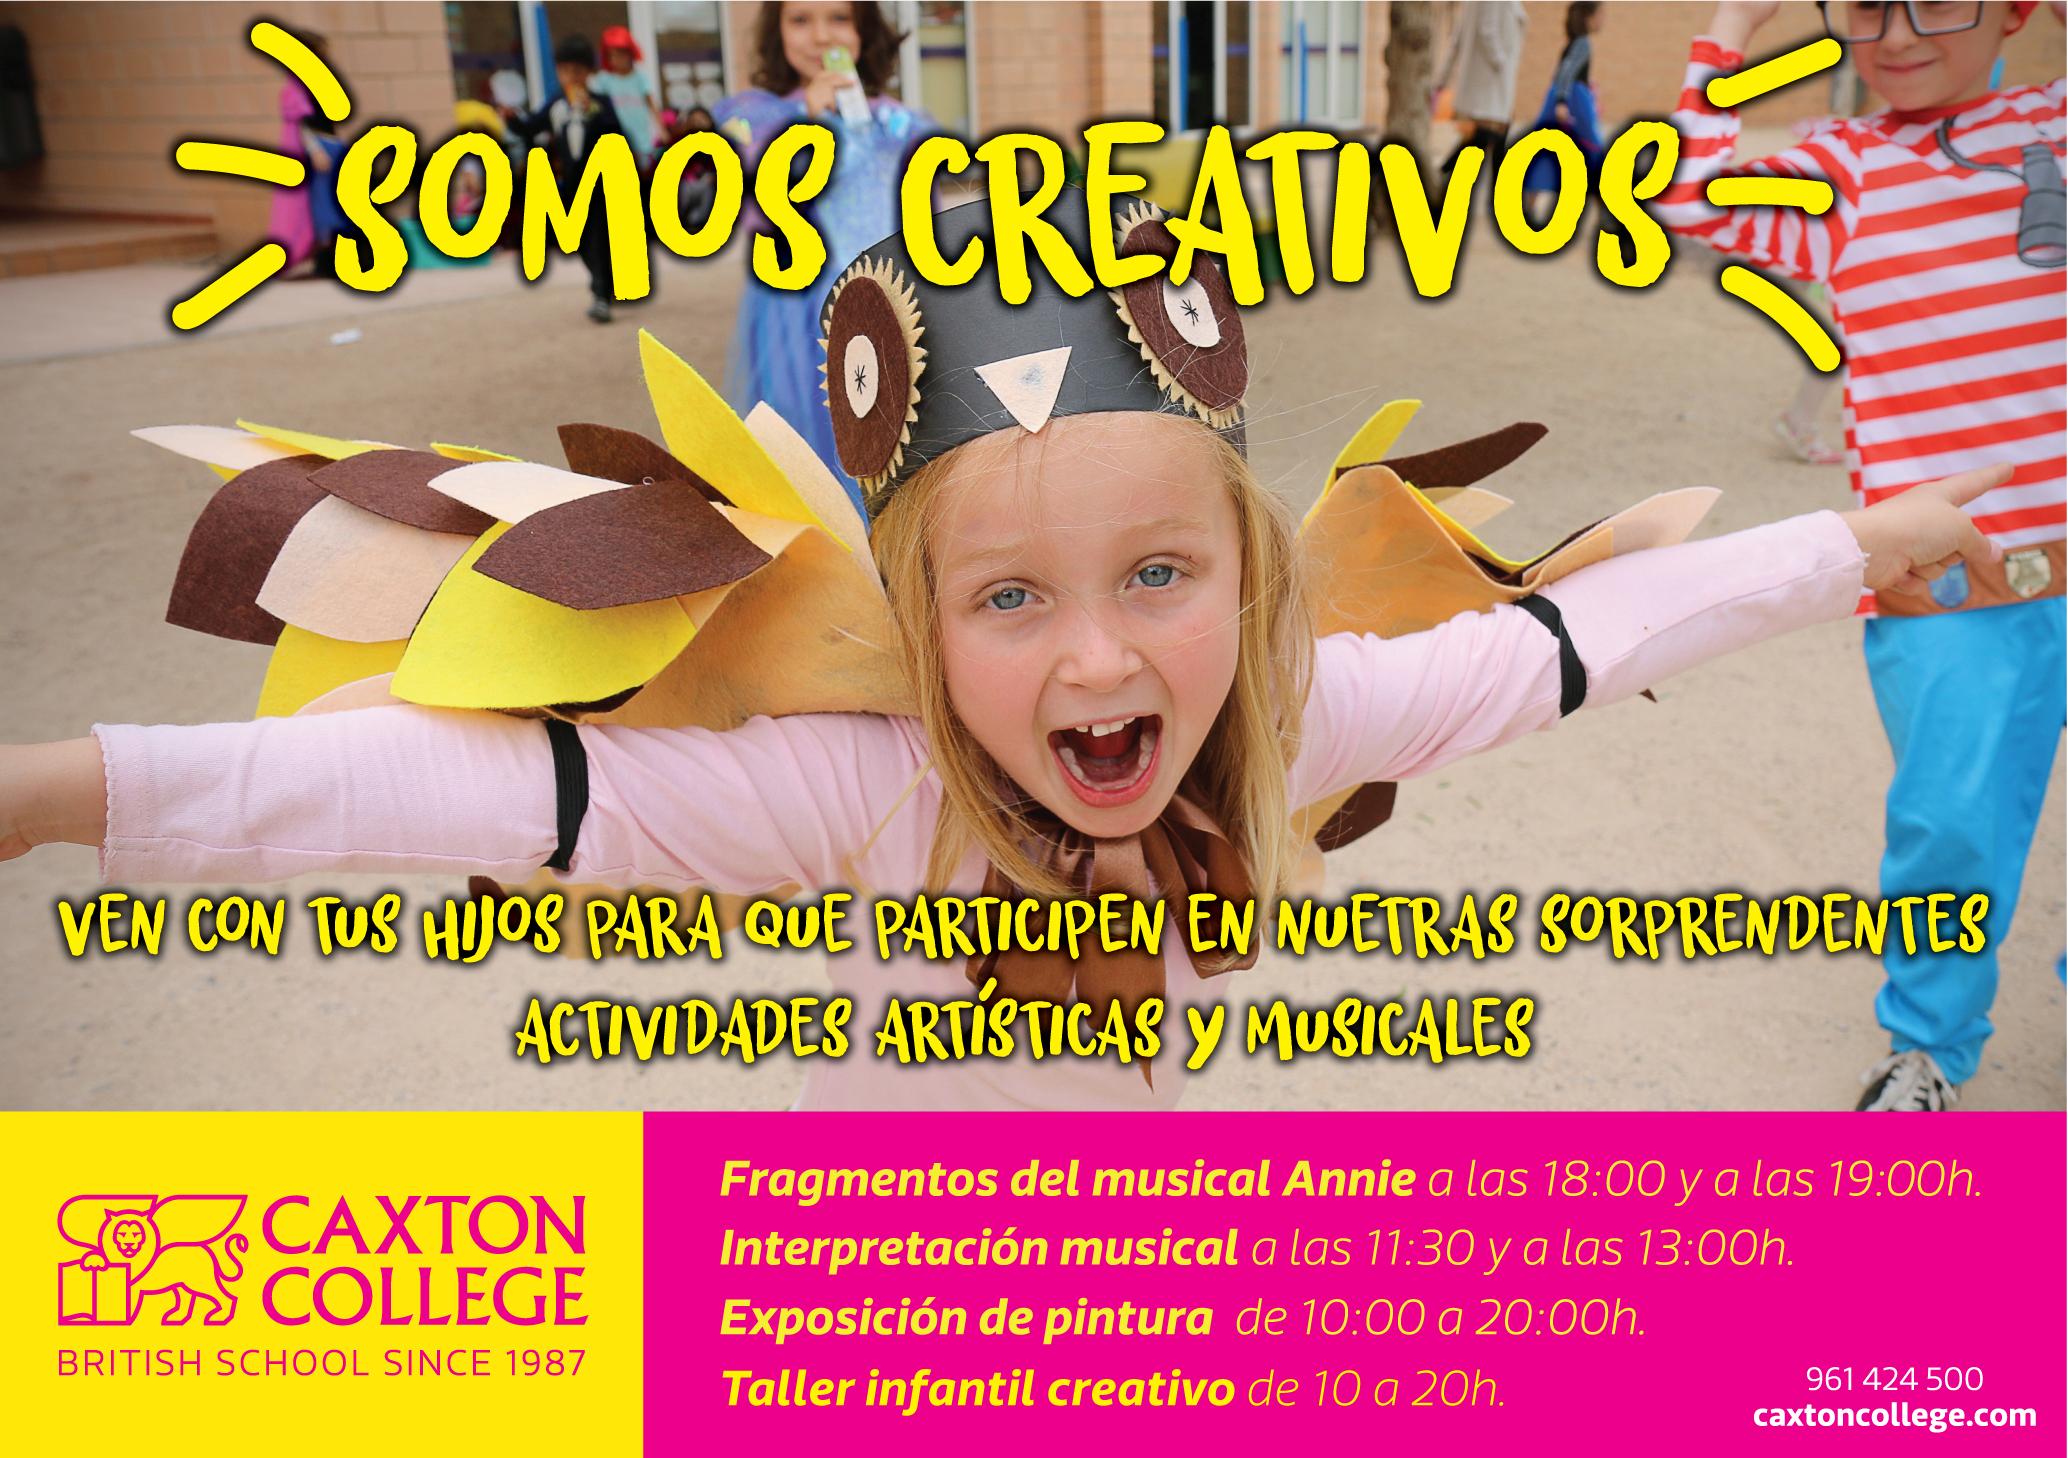 caxton college somos creativos aqua valencia